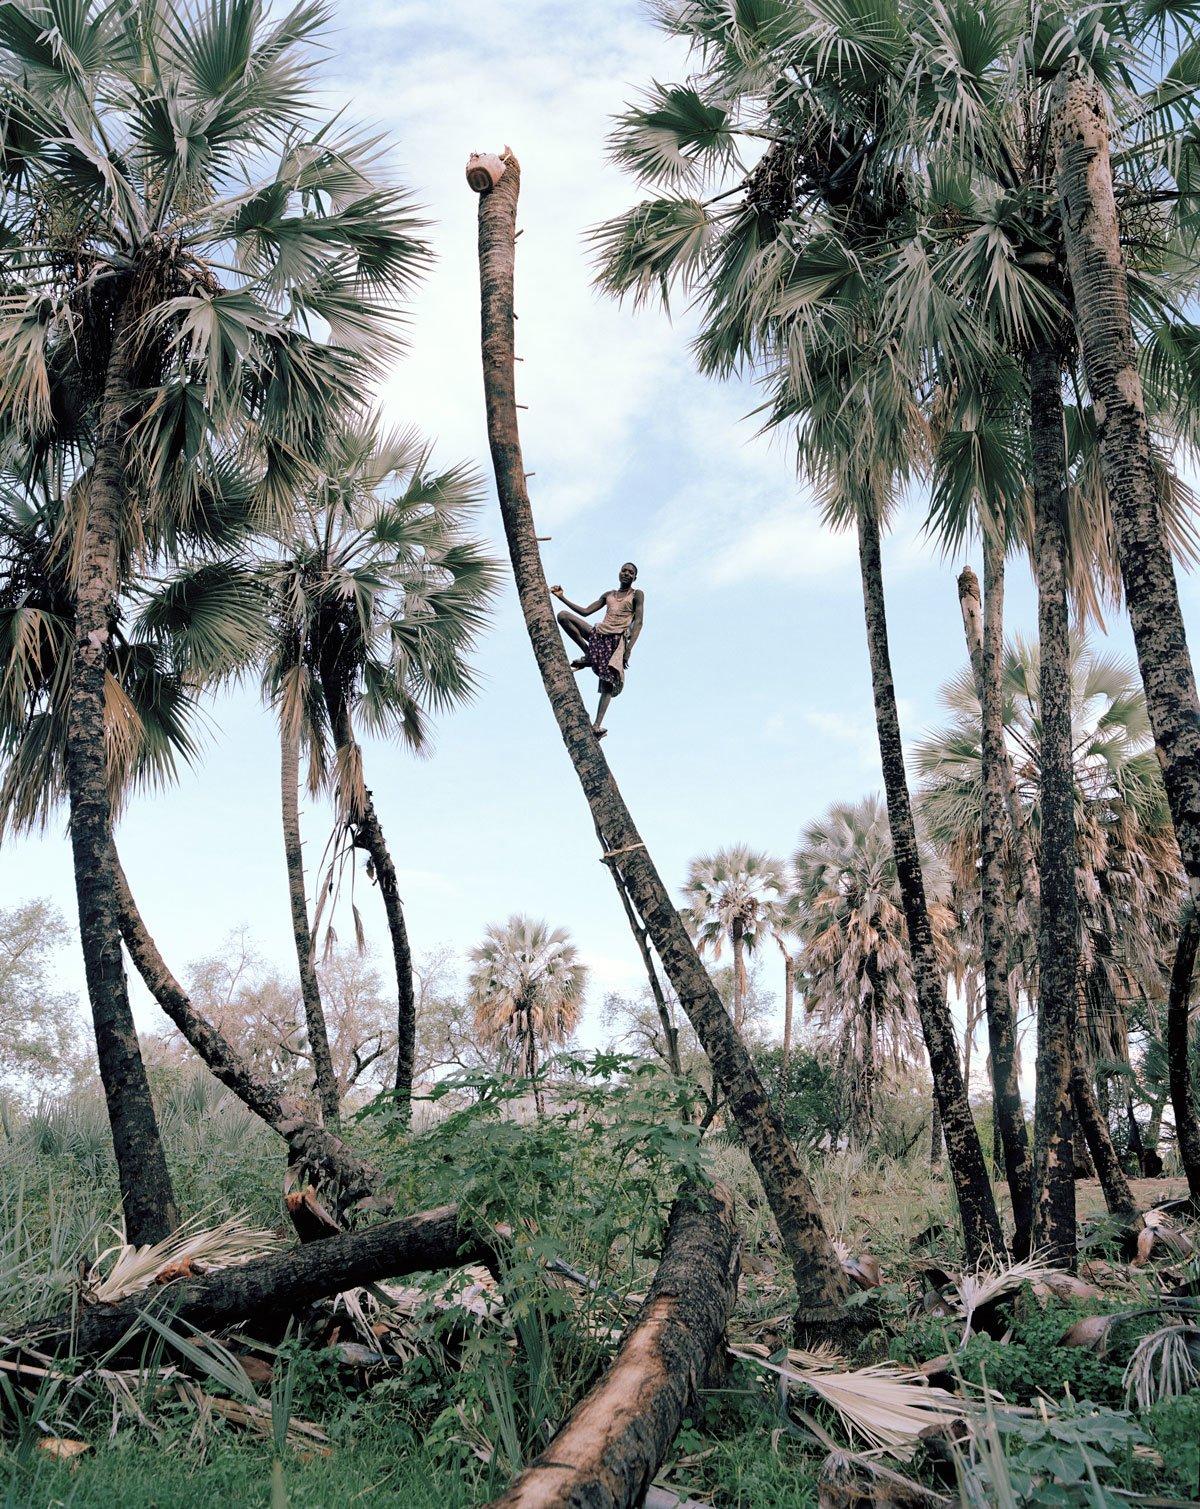 Рабочий, собирающий пальмовое масло. Кунене, Намибия.